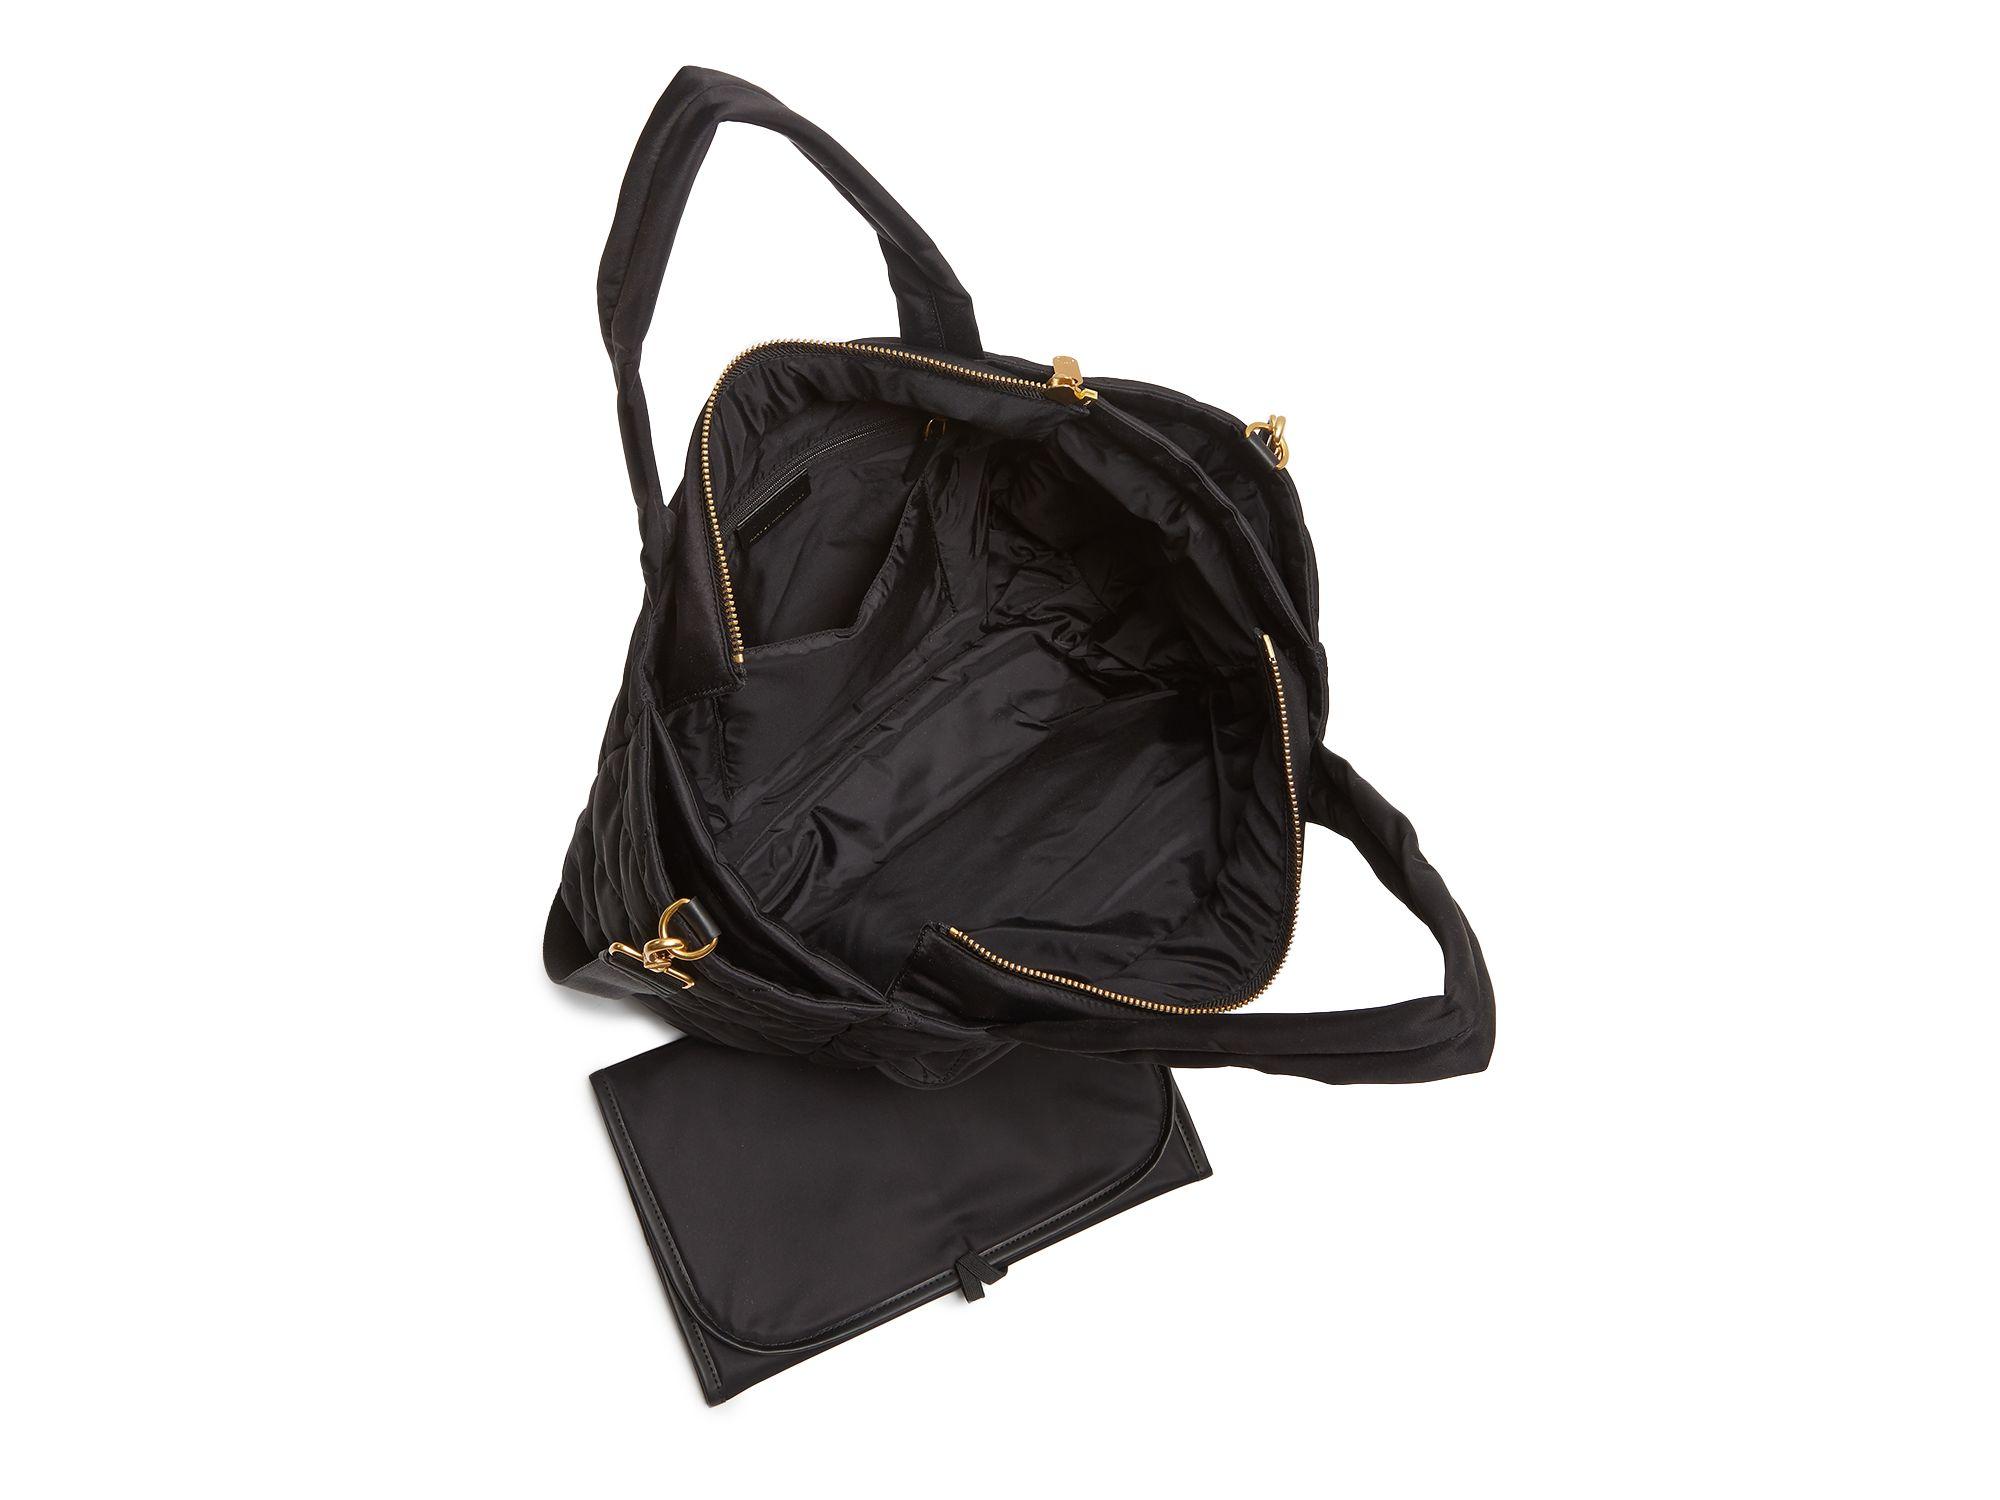 marc by marc jacobs diaper bag crosby quilt nylon. Black Bedroom Furniture Sets. Home Design Ideas